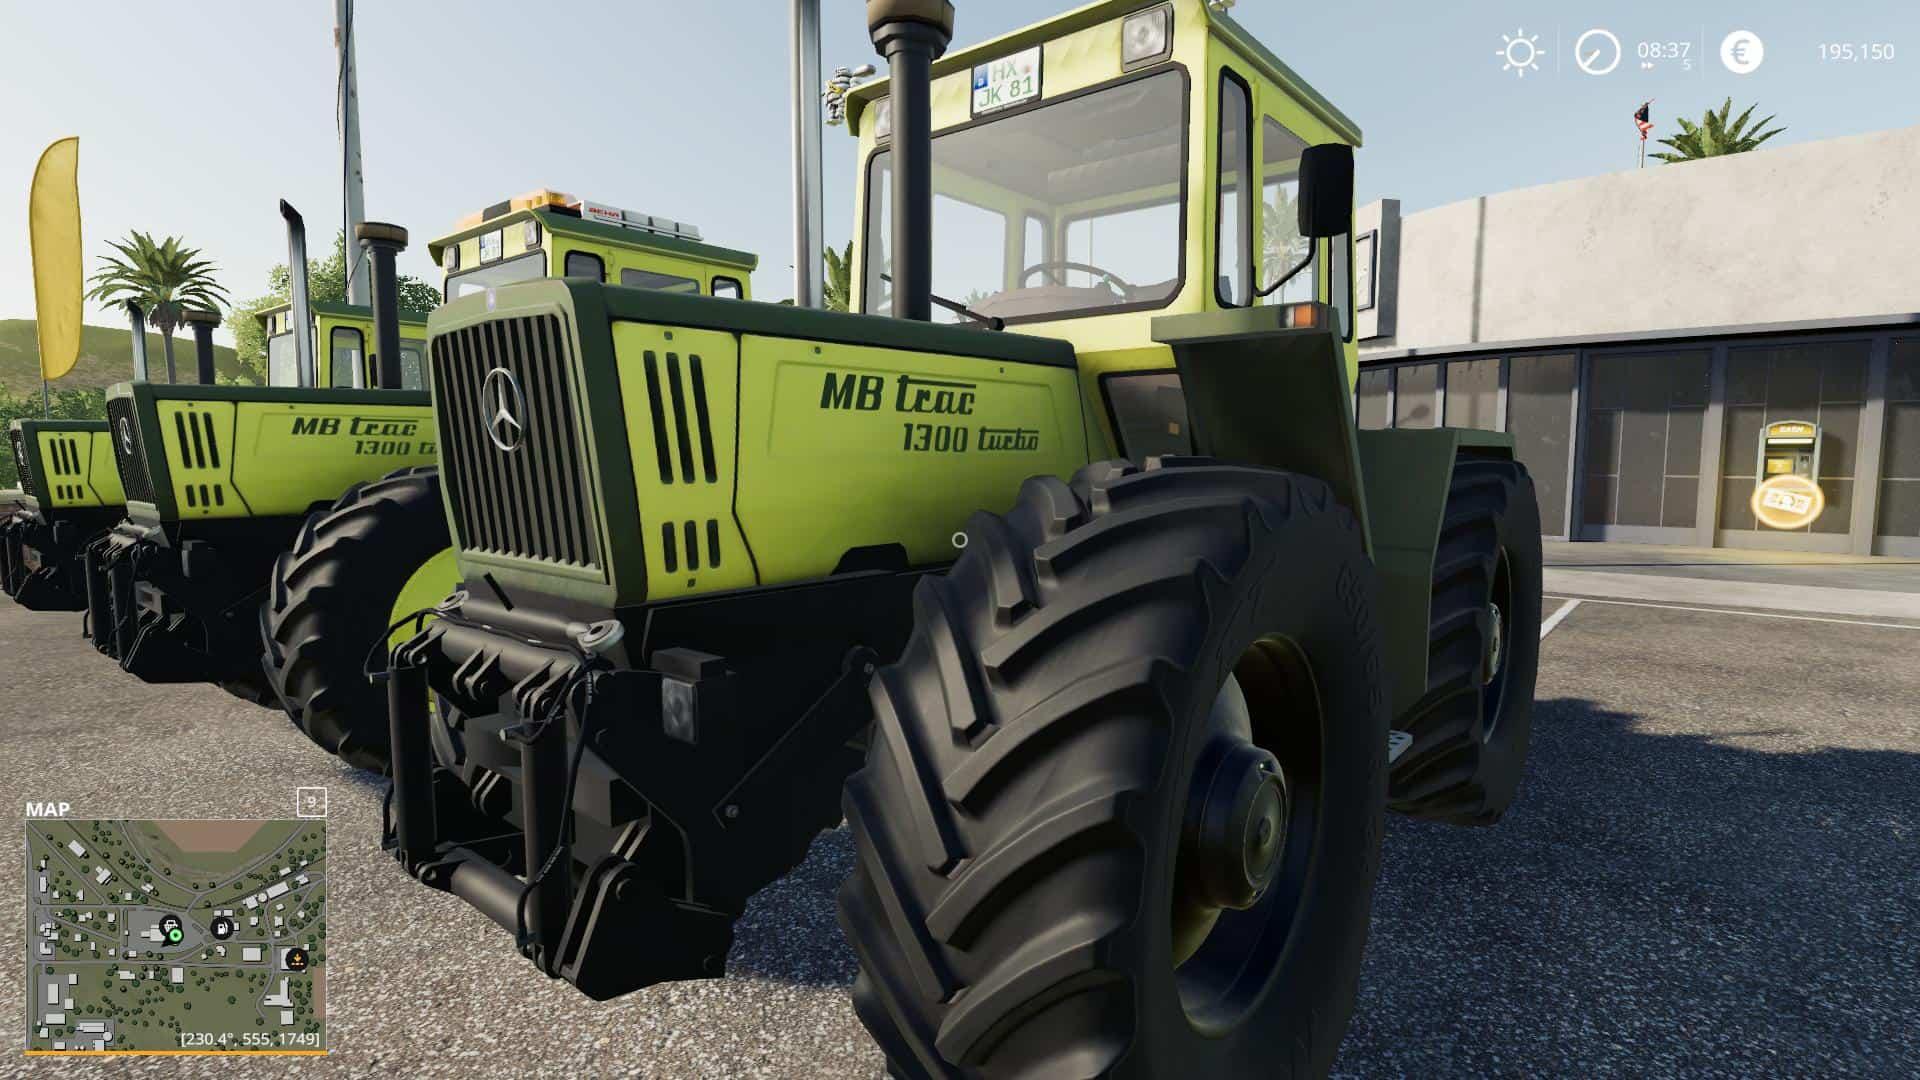 MB Track Pack v1 2 Mod - Farming Simulator 19 Mod / FS19